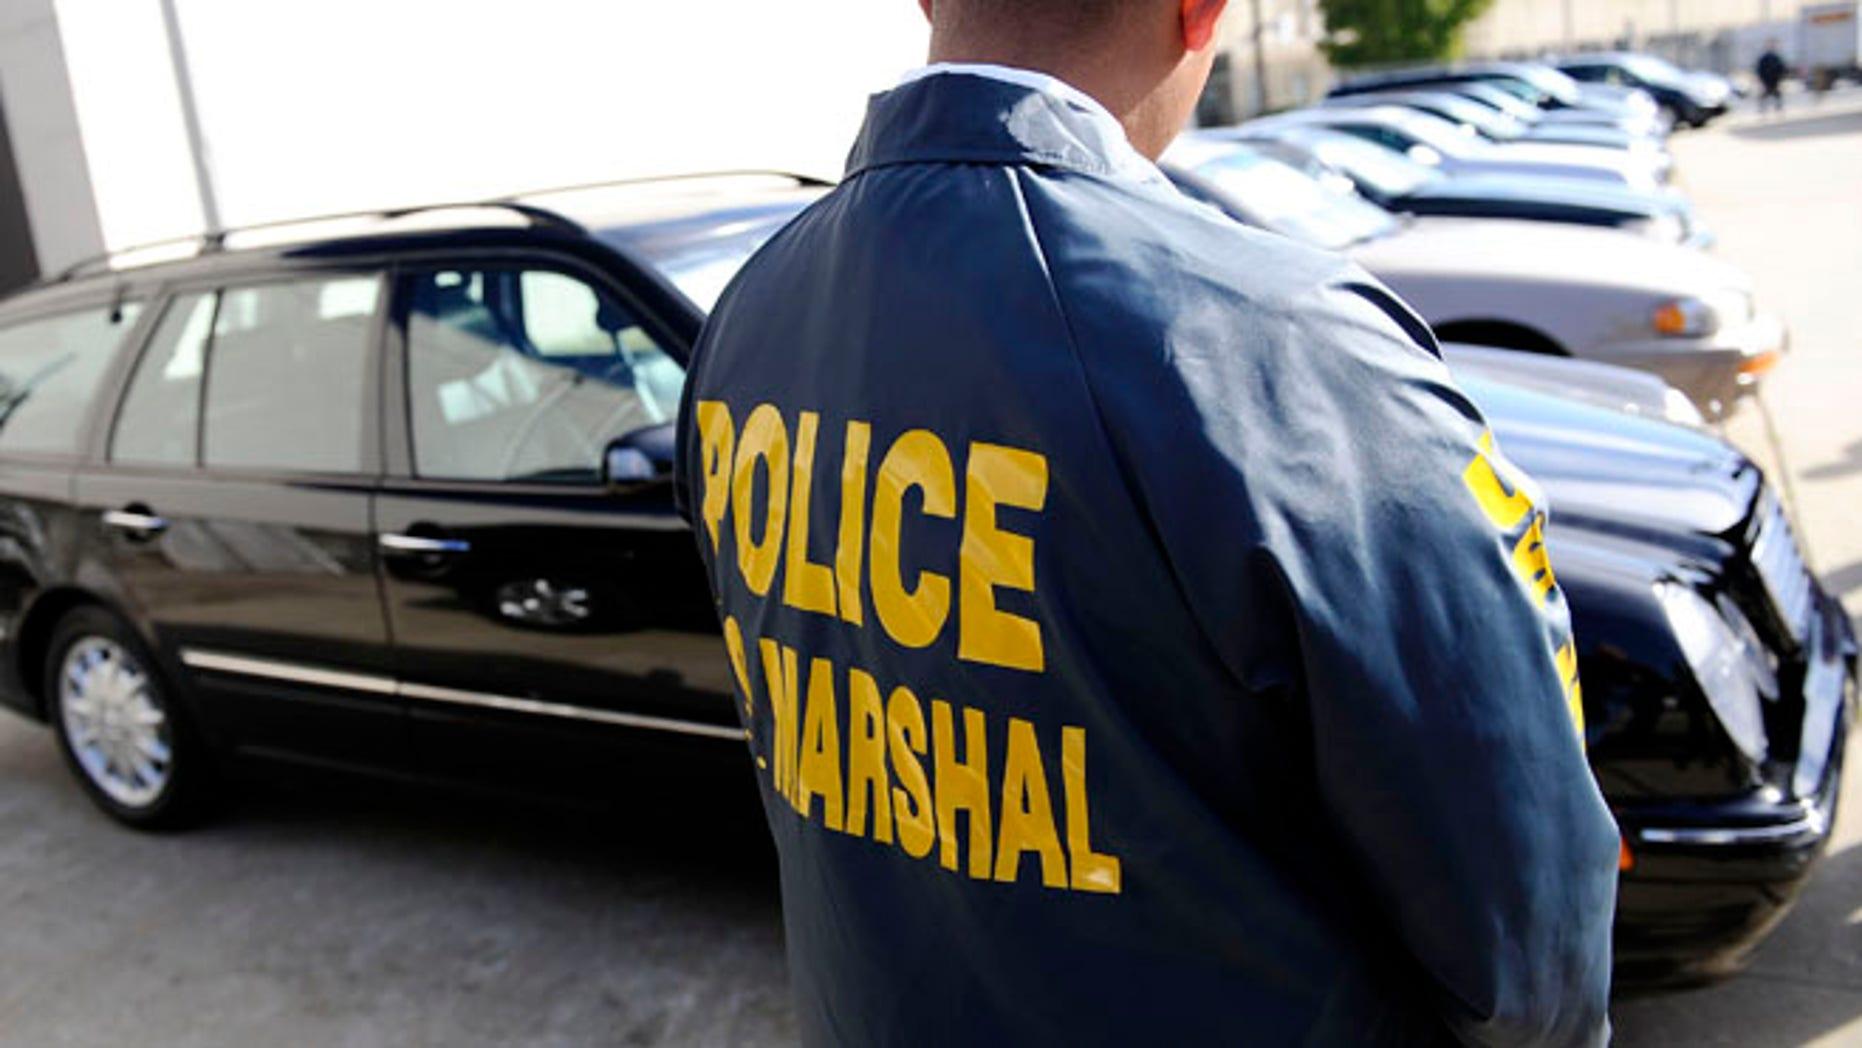 FILE: (UNDATED) A U.S. marshal. REUTERS